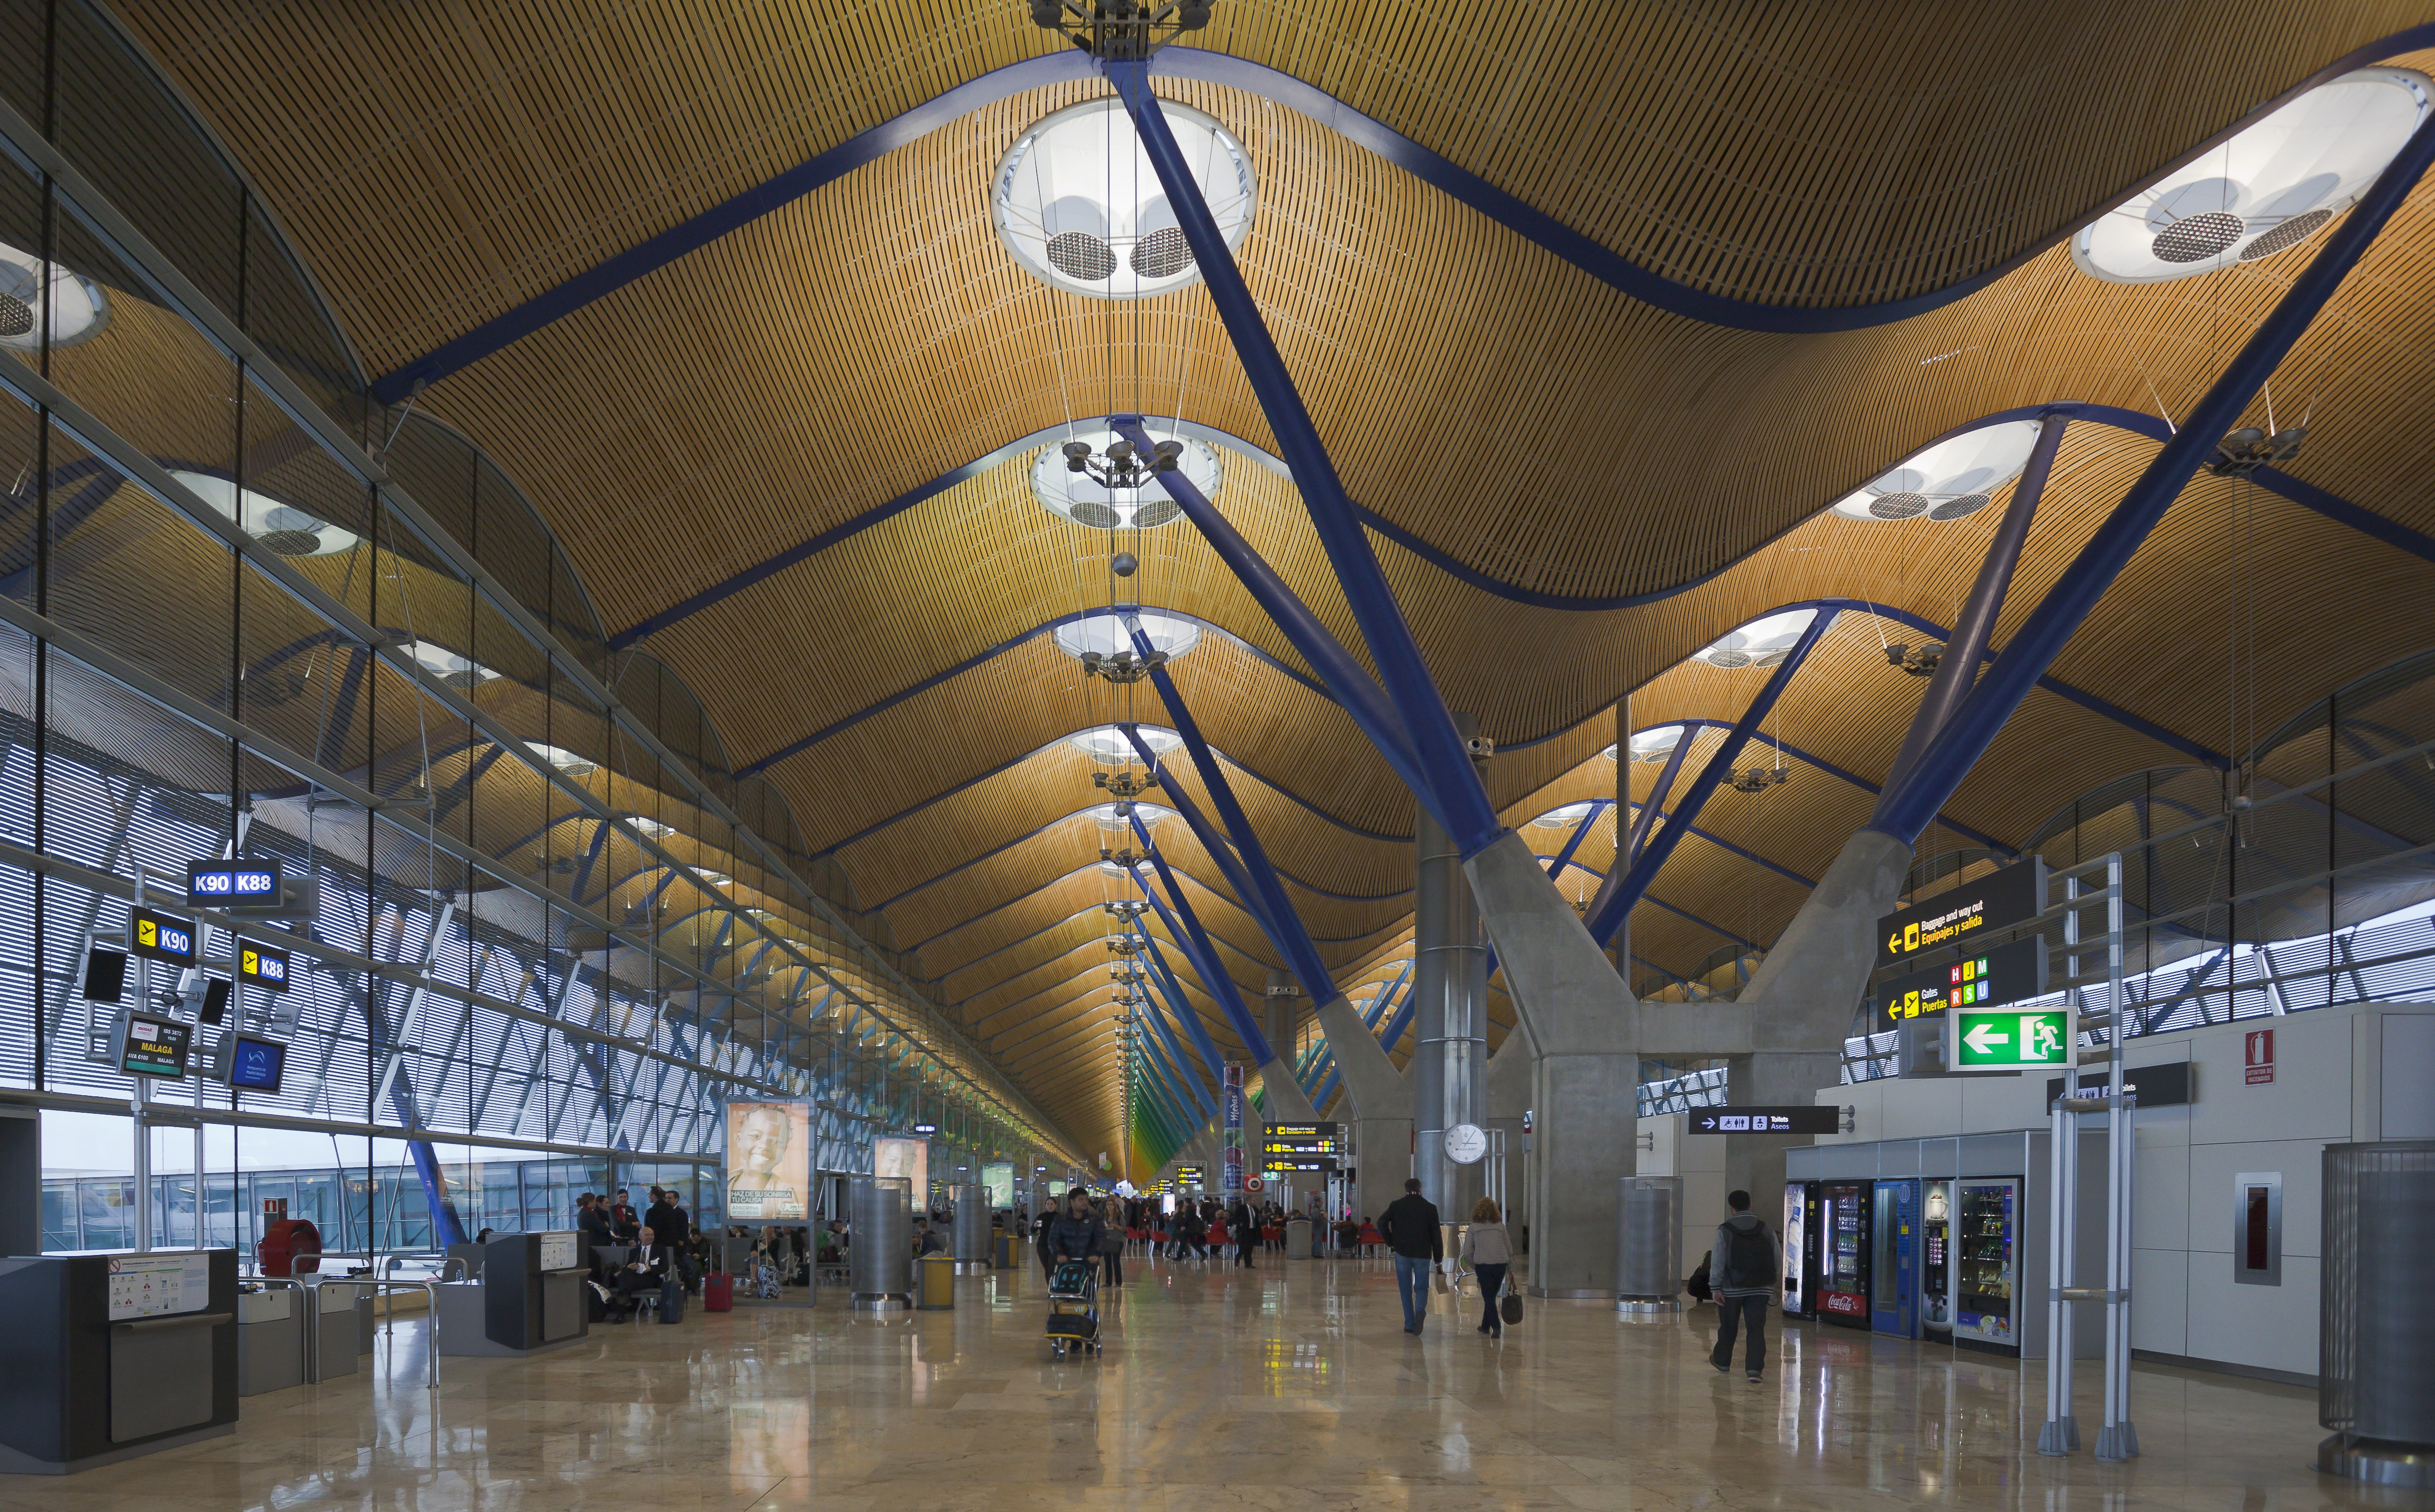 Madrid International Airport: photos and descriptions, terminals, flights and passenger reviews 68